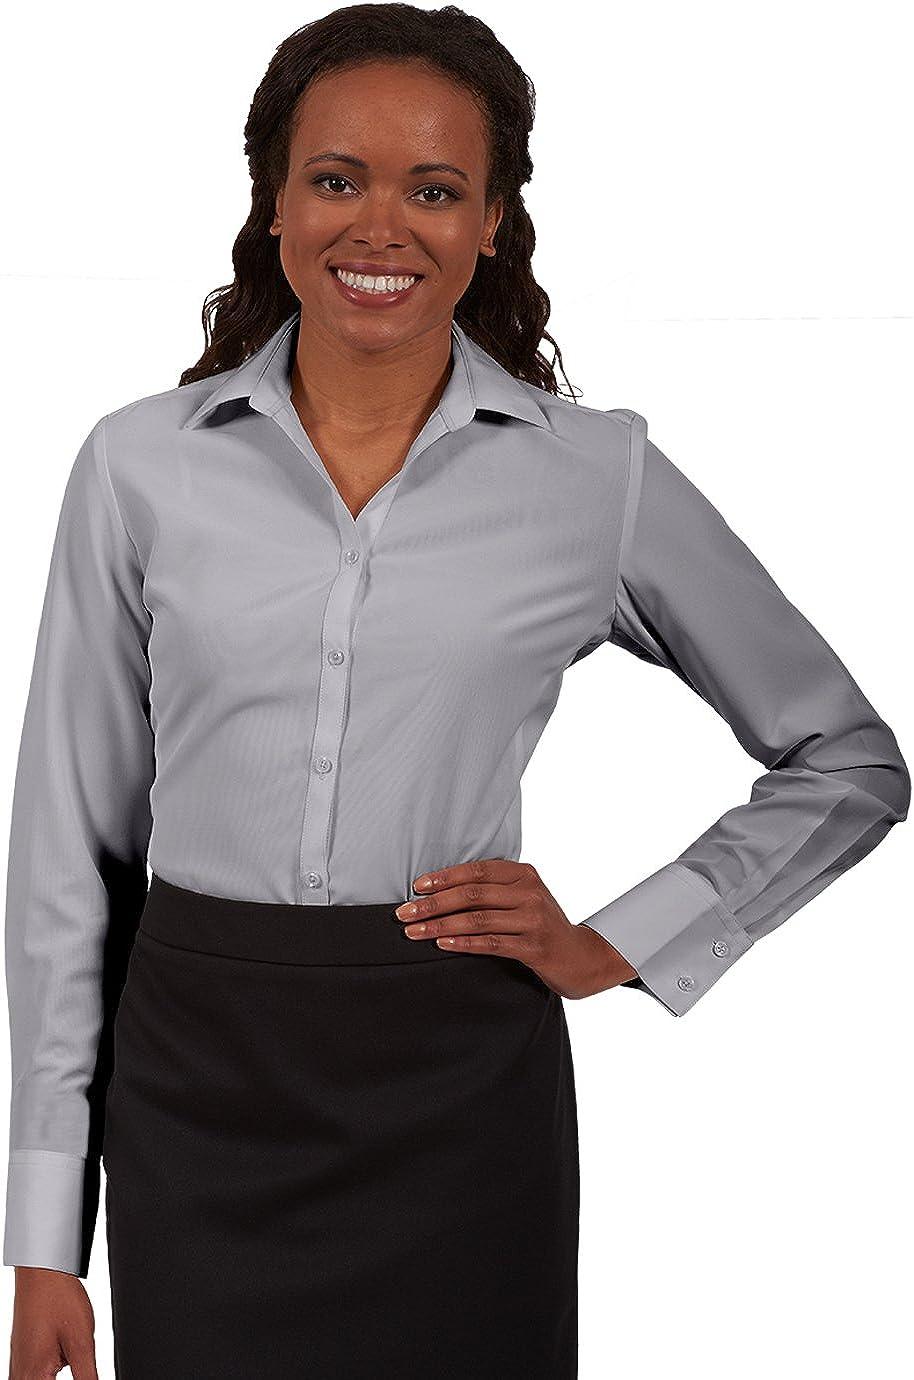 Edwards Garment Women's Batiste French Cuff Narrow Placket Blouse Shirt